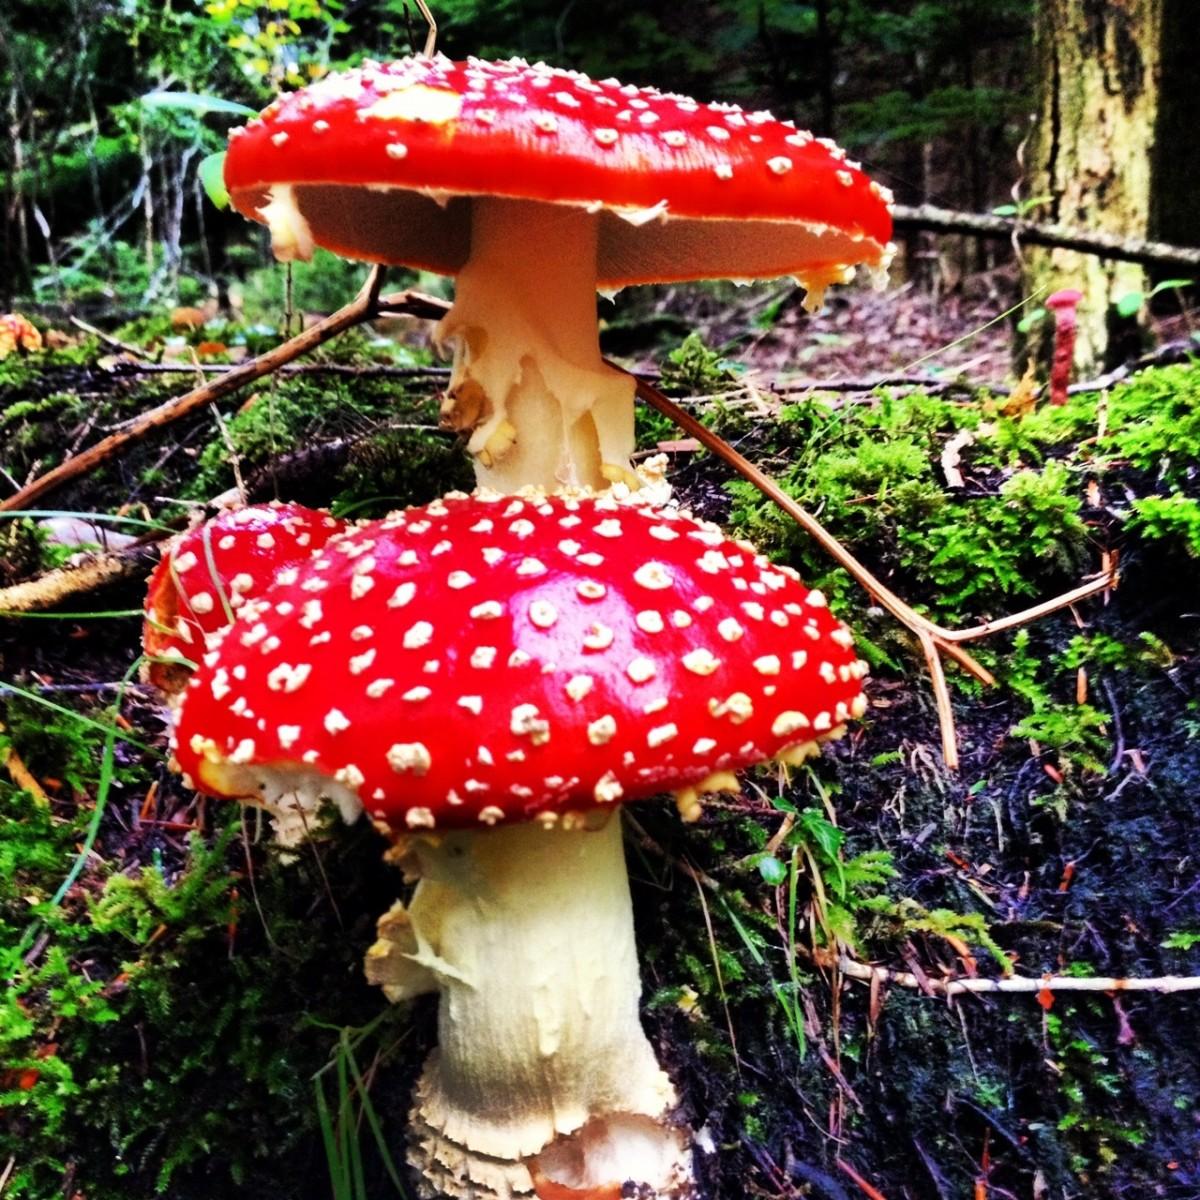 Picking Edible Wild Mushrooms, Wild Mushroom Hunting